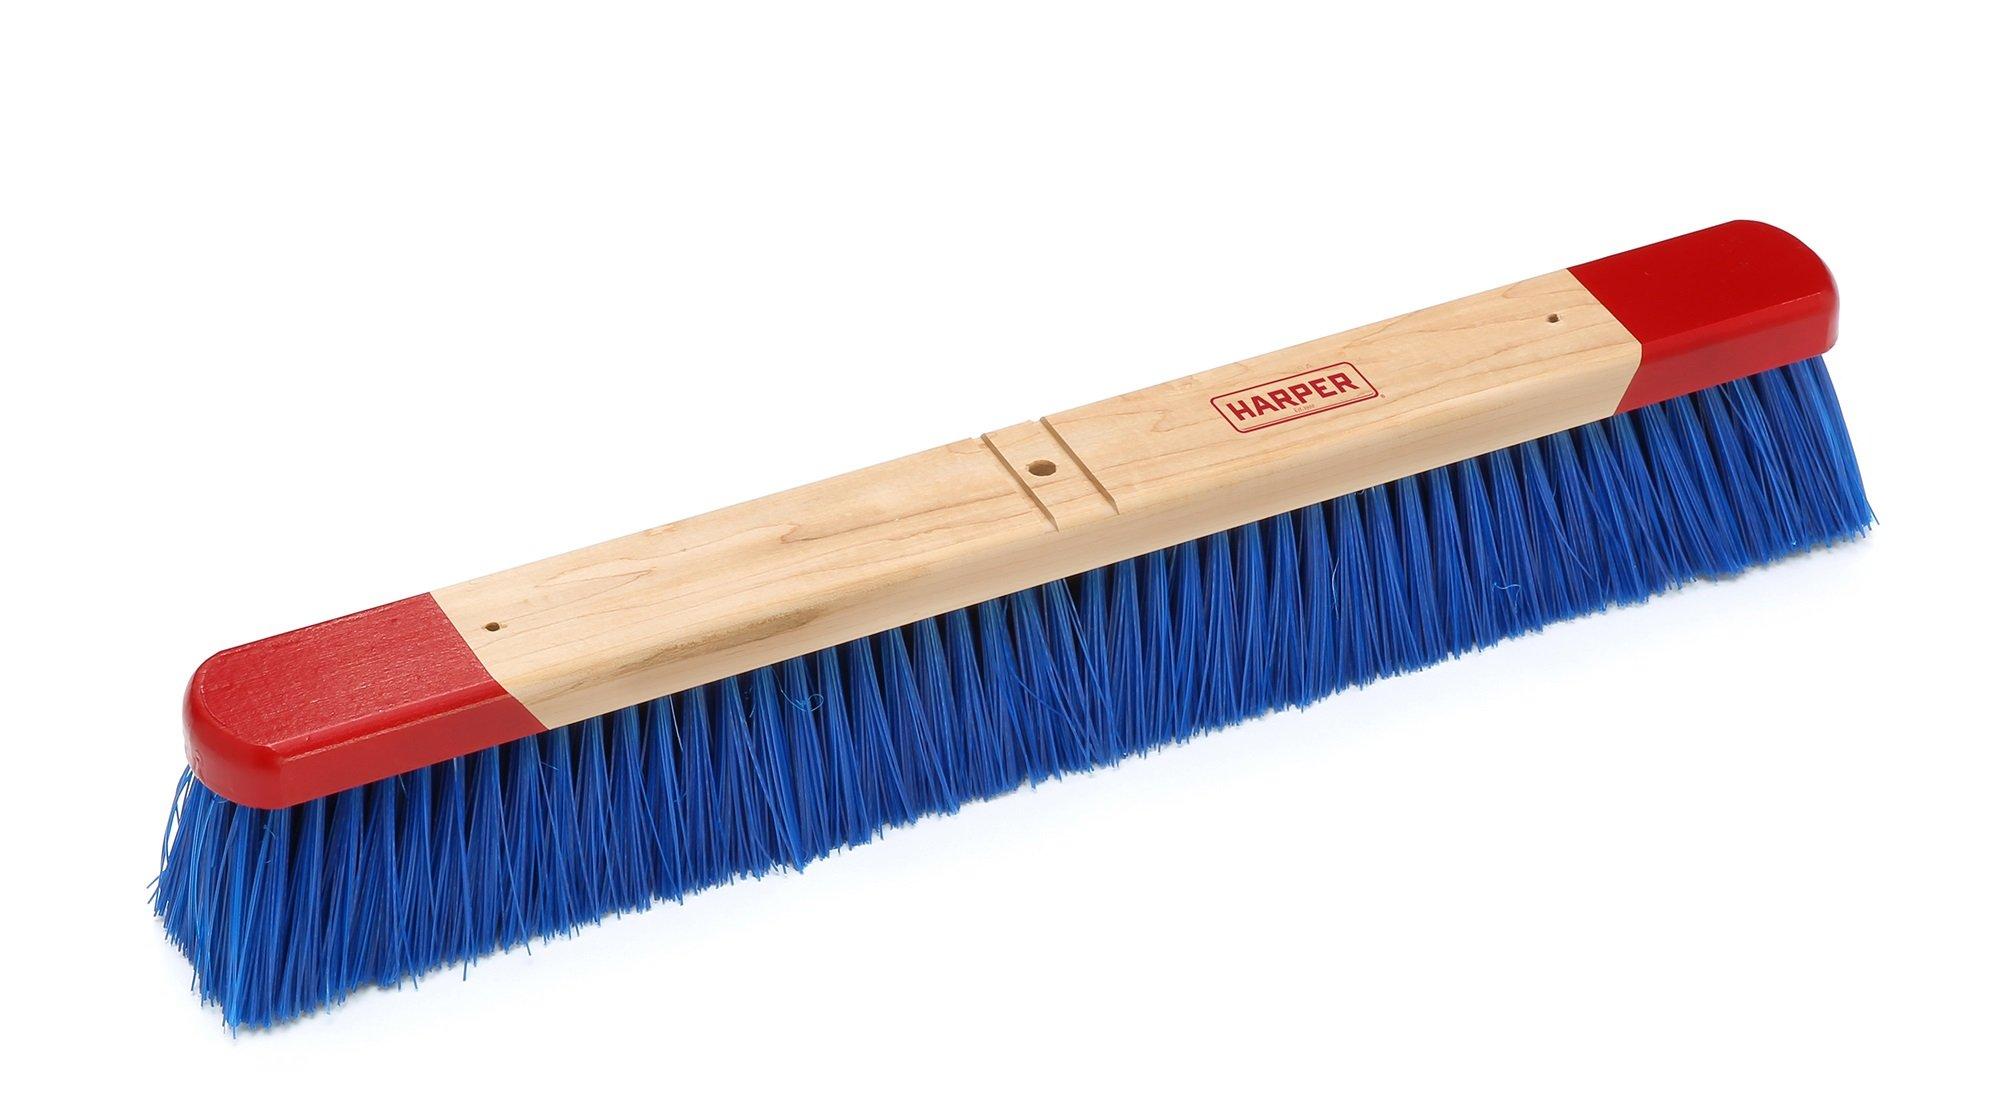 Harper Brush 792412 Broom Head, Polypropylene Fiber, Outdoor, Rough Wet or Dry Surface, Maple, 24'' (Pack of 6)